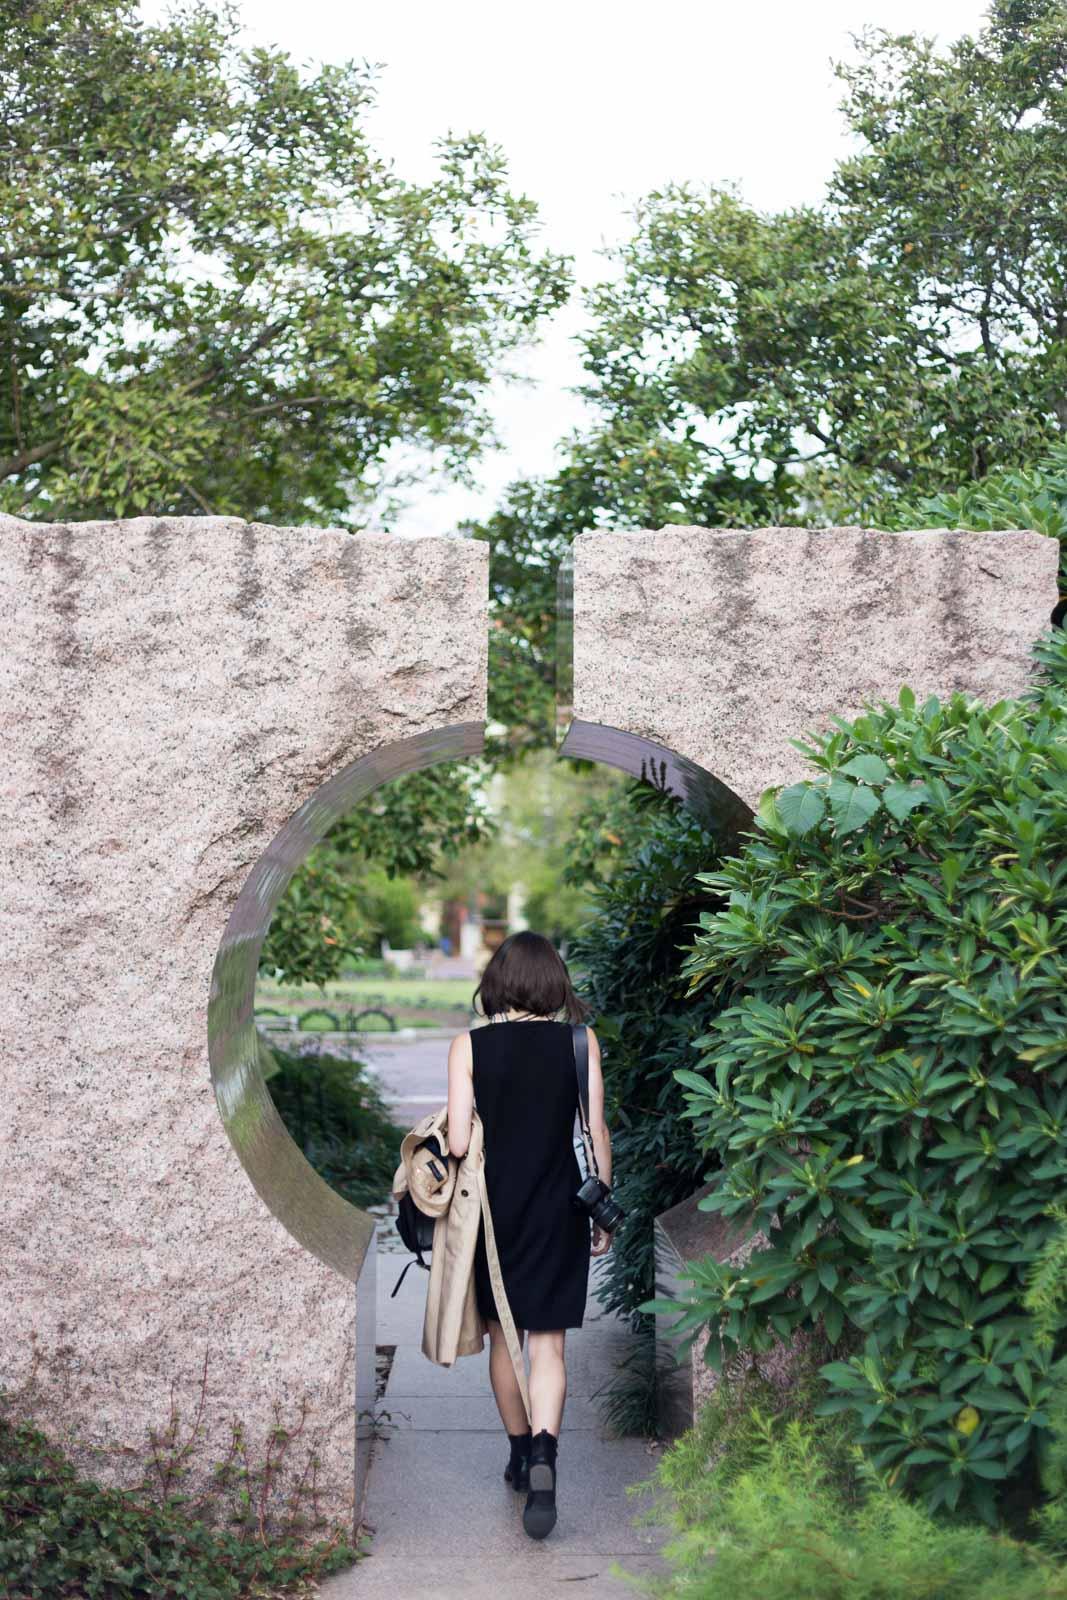 Moongate Garden, D.C.